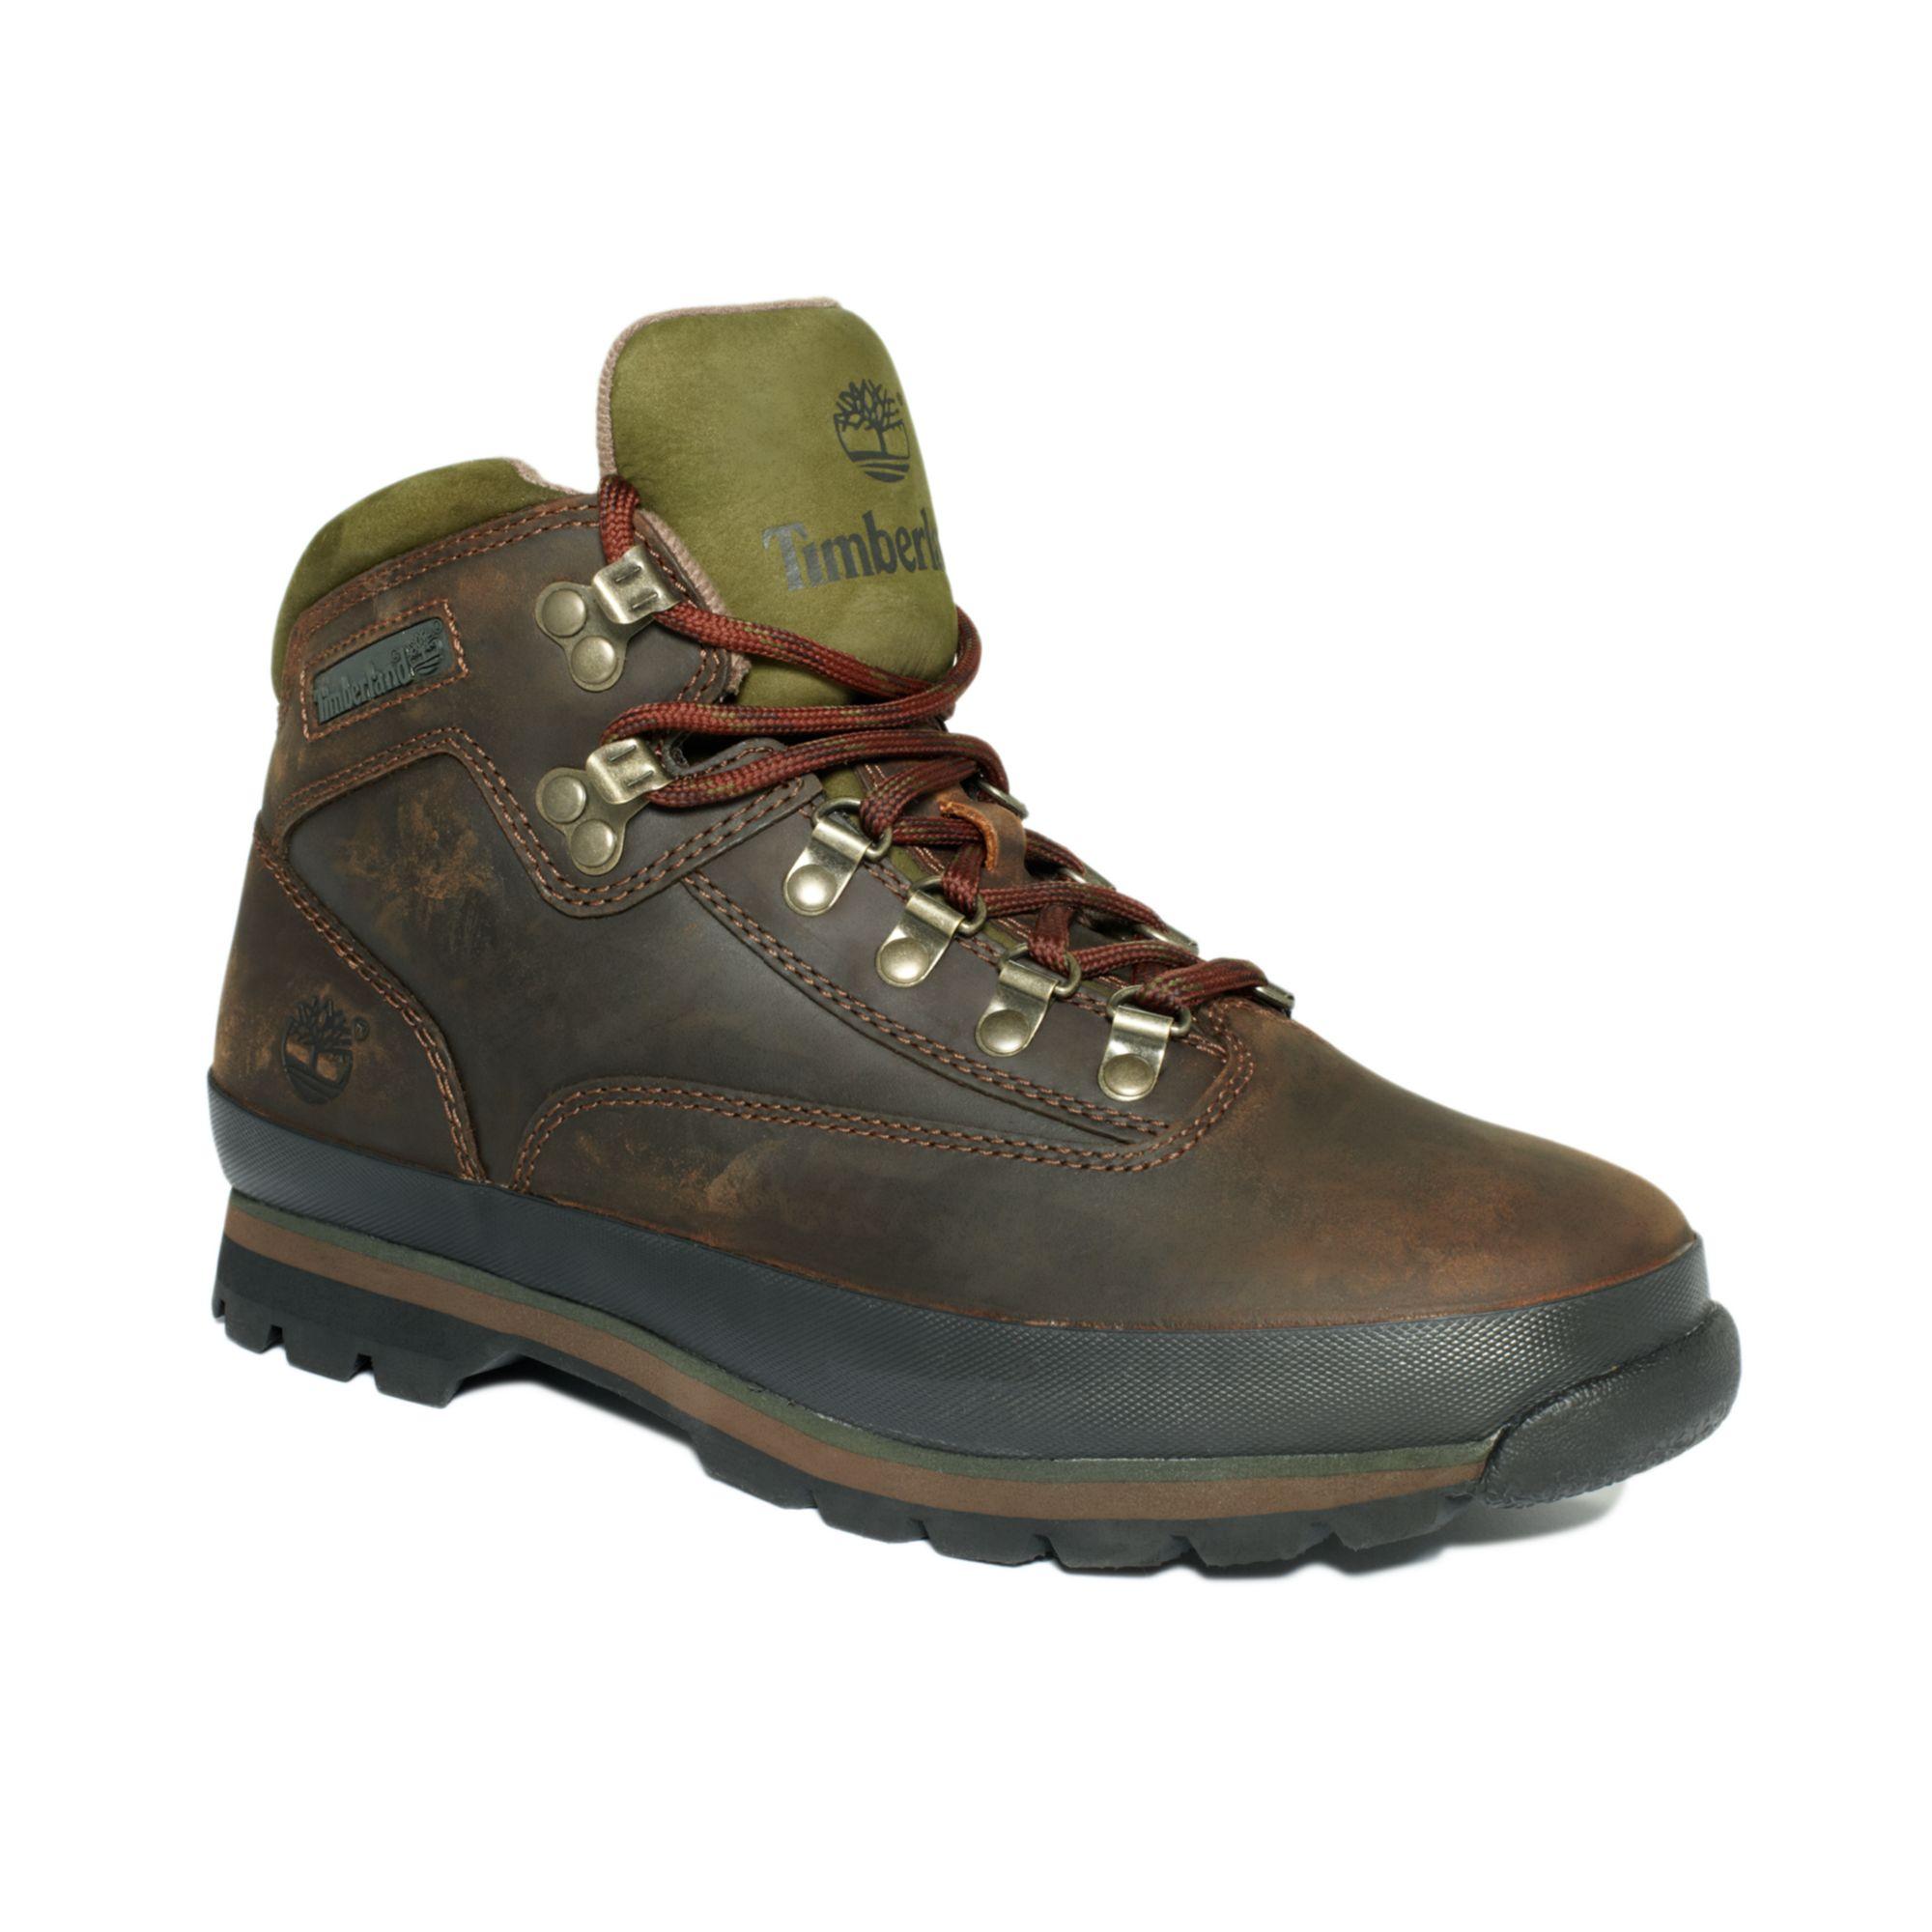 timberland men's euro hiker boots dark brown